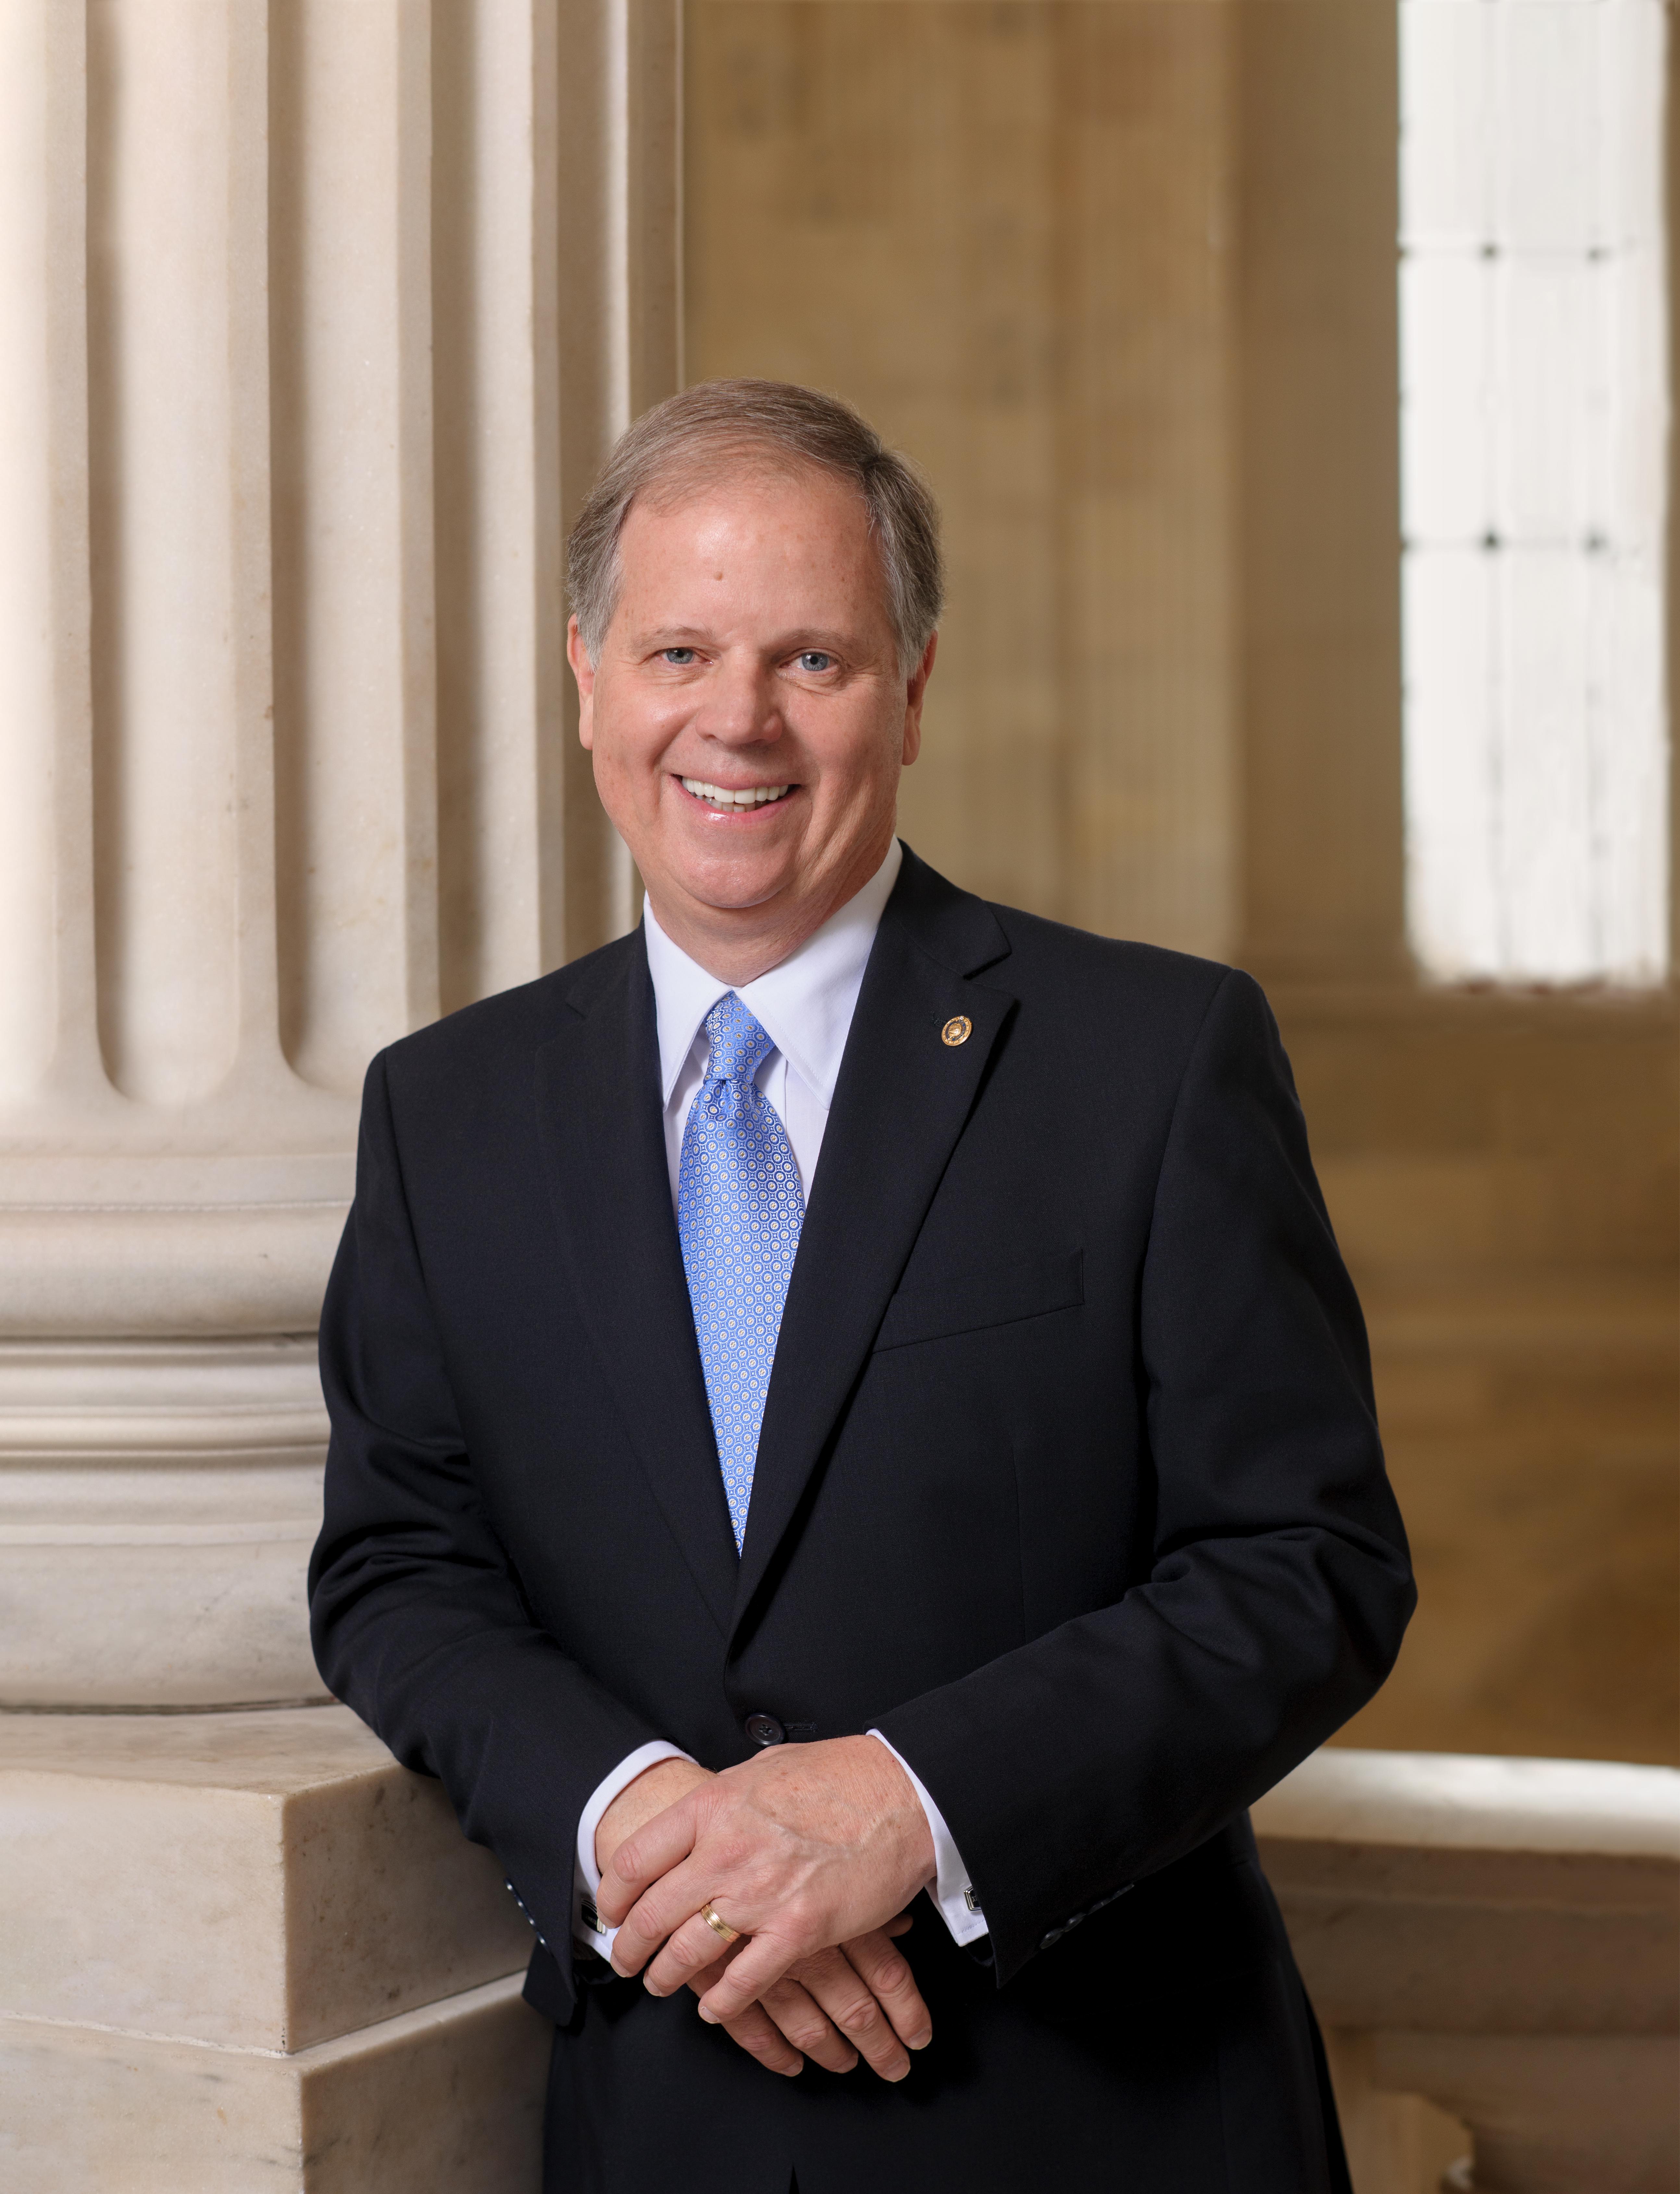 Senator Doug Jones